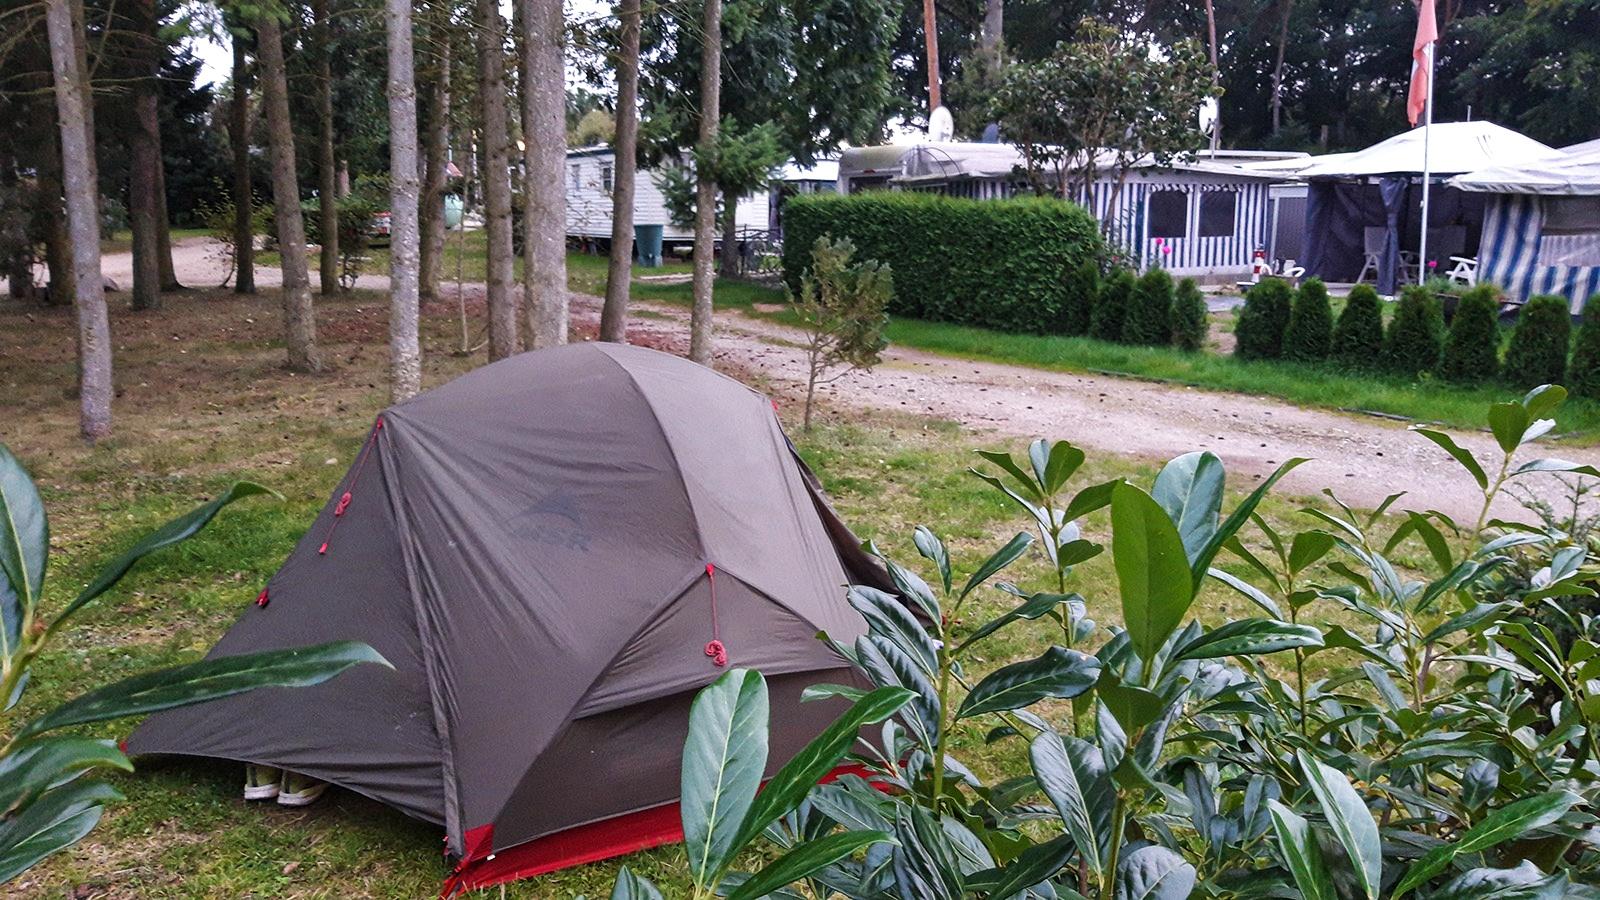 Trekking-Zelt auf Campingplatz